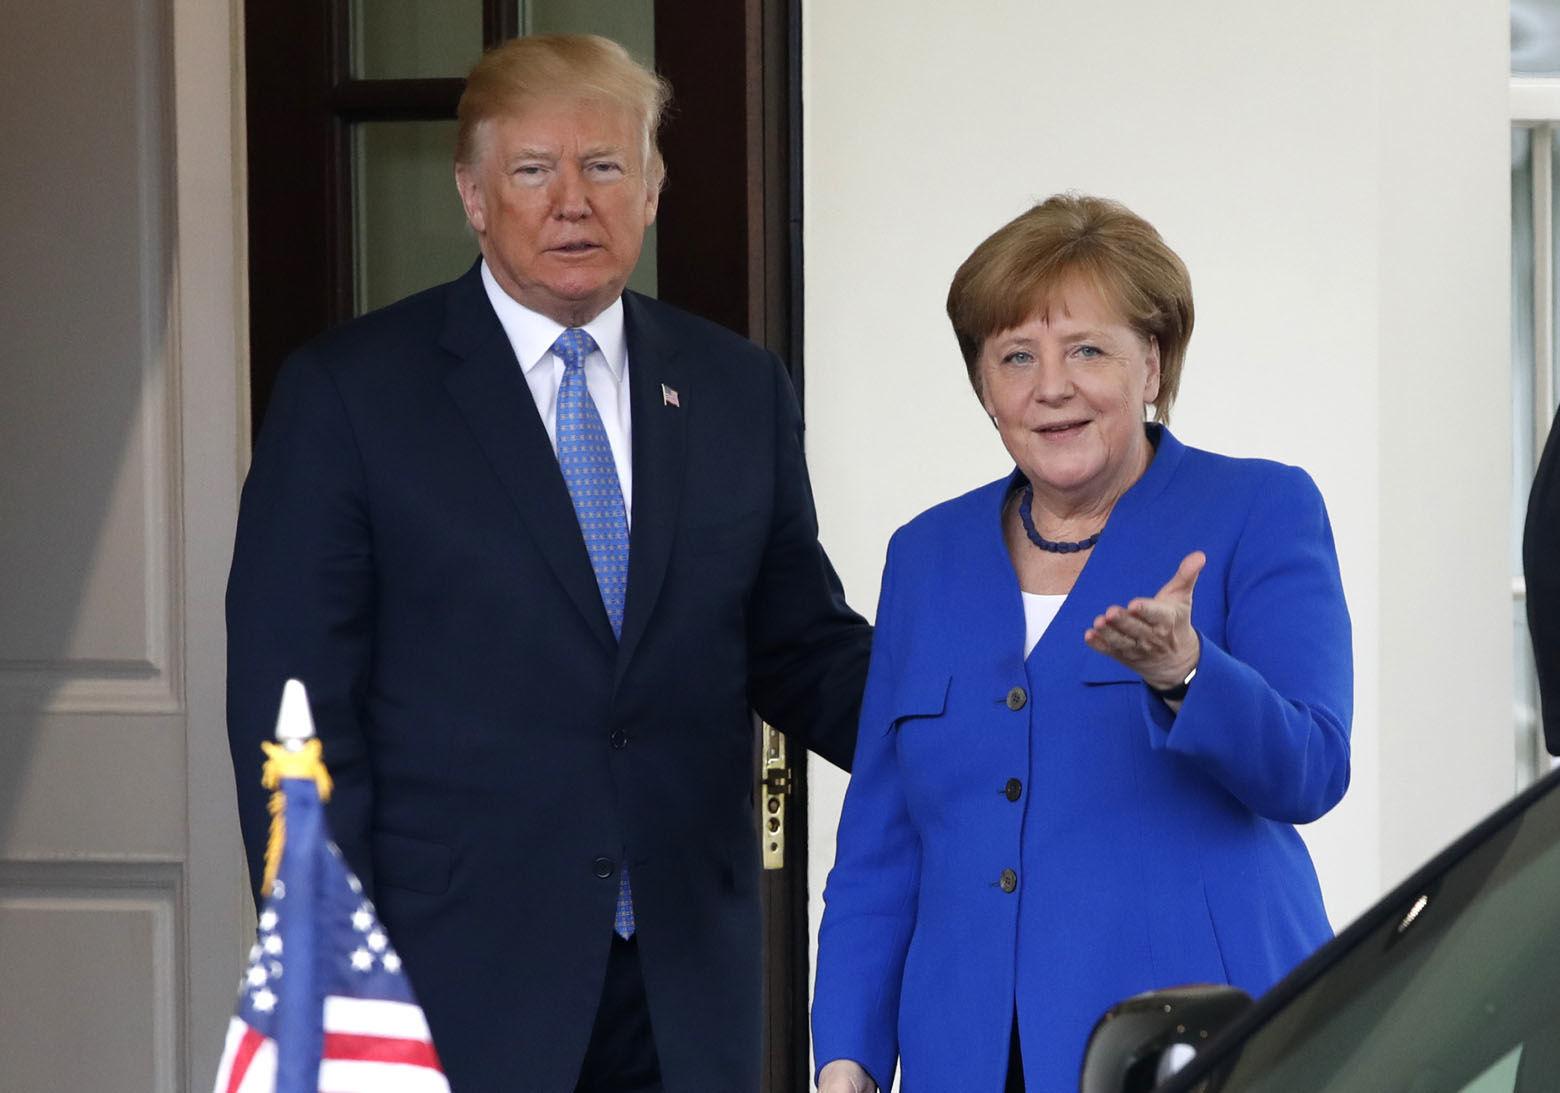 President Donald Trump greets German Chancellor Angela Merkel, Friday April 27, 2018, at the White House in Washington. (AP Photo/Jacquelyn Martin)